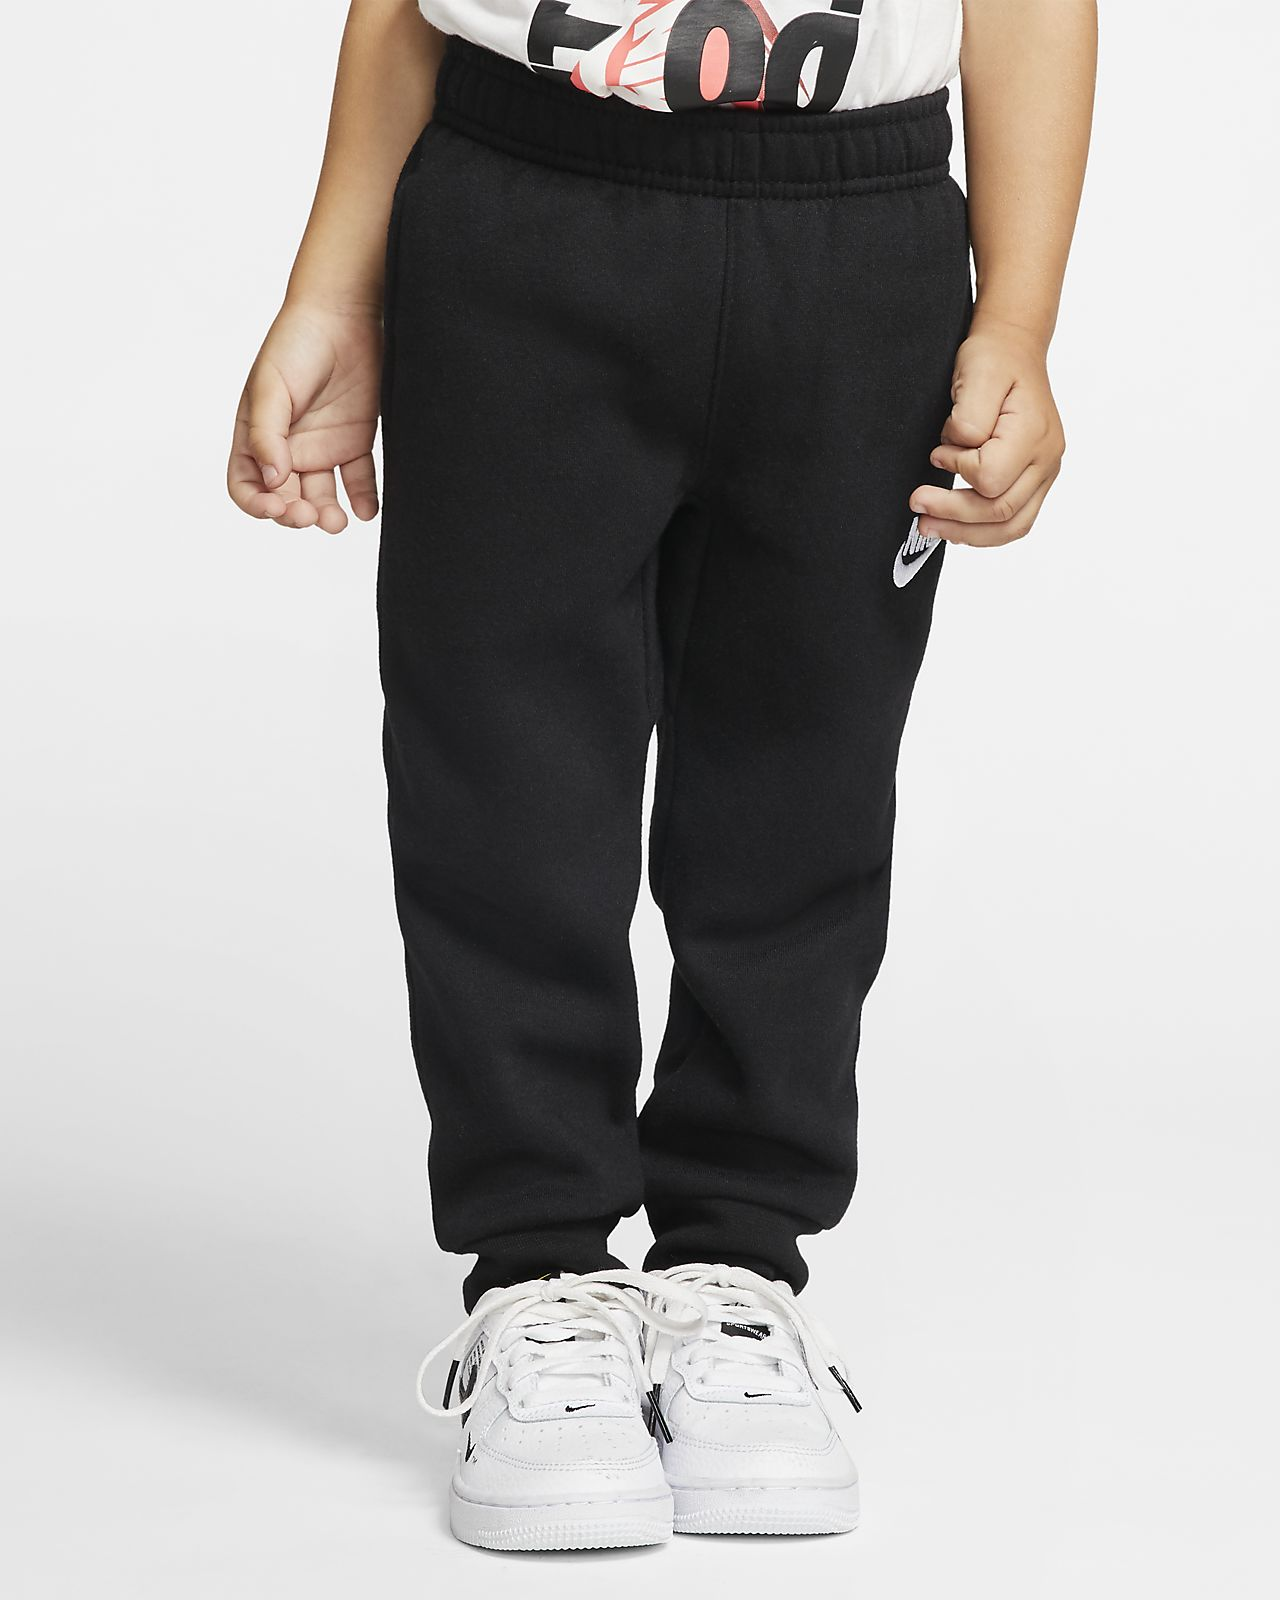 Pantaloni con risvolto Nike Club Fleece - Bimbi piccoli